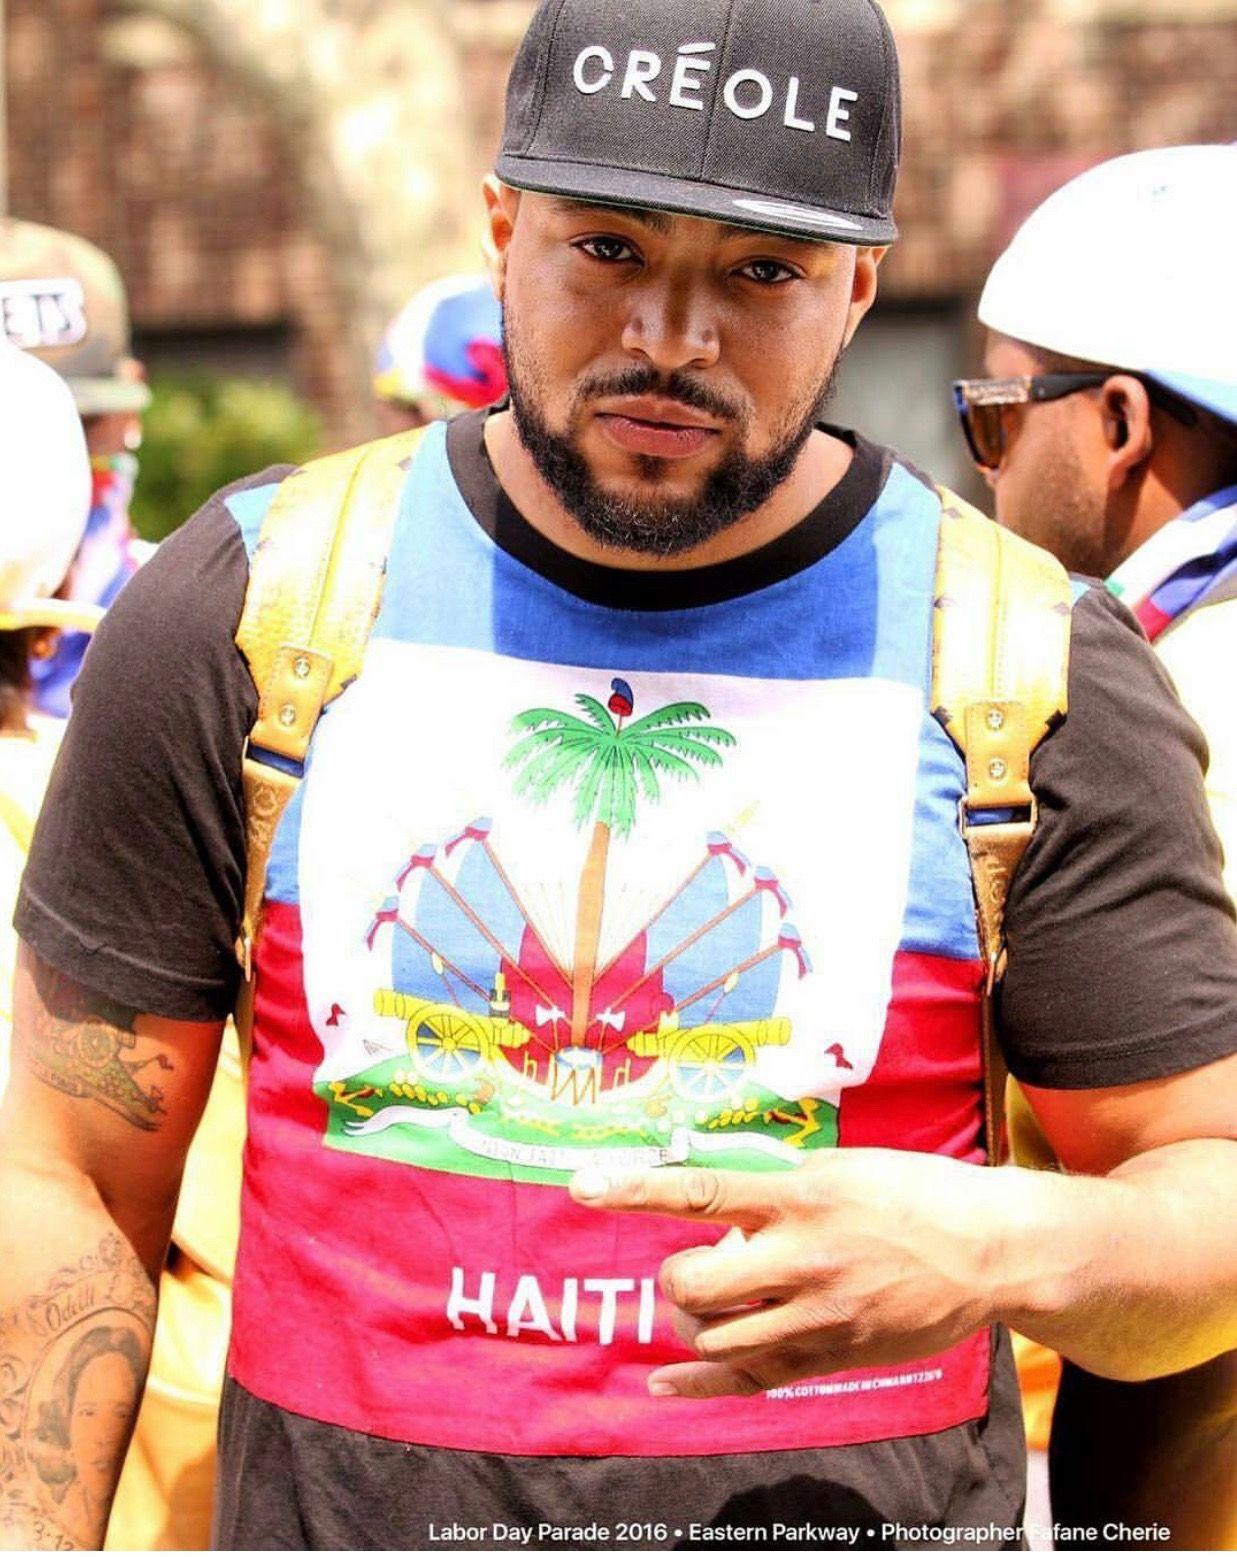 Haitian Creole Caribbean | Creole, Haitian creole, Haiti